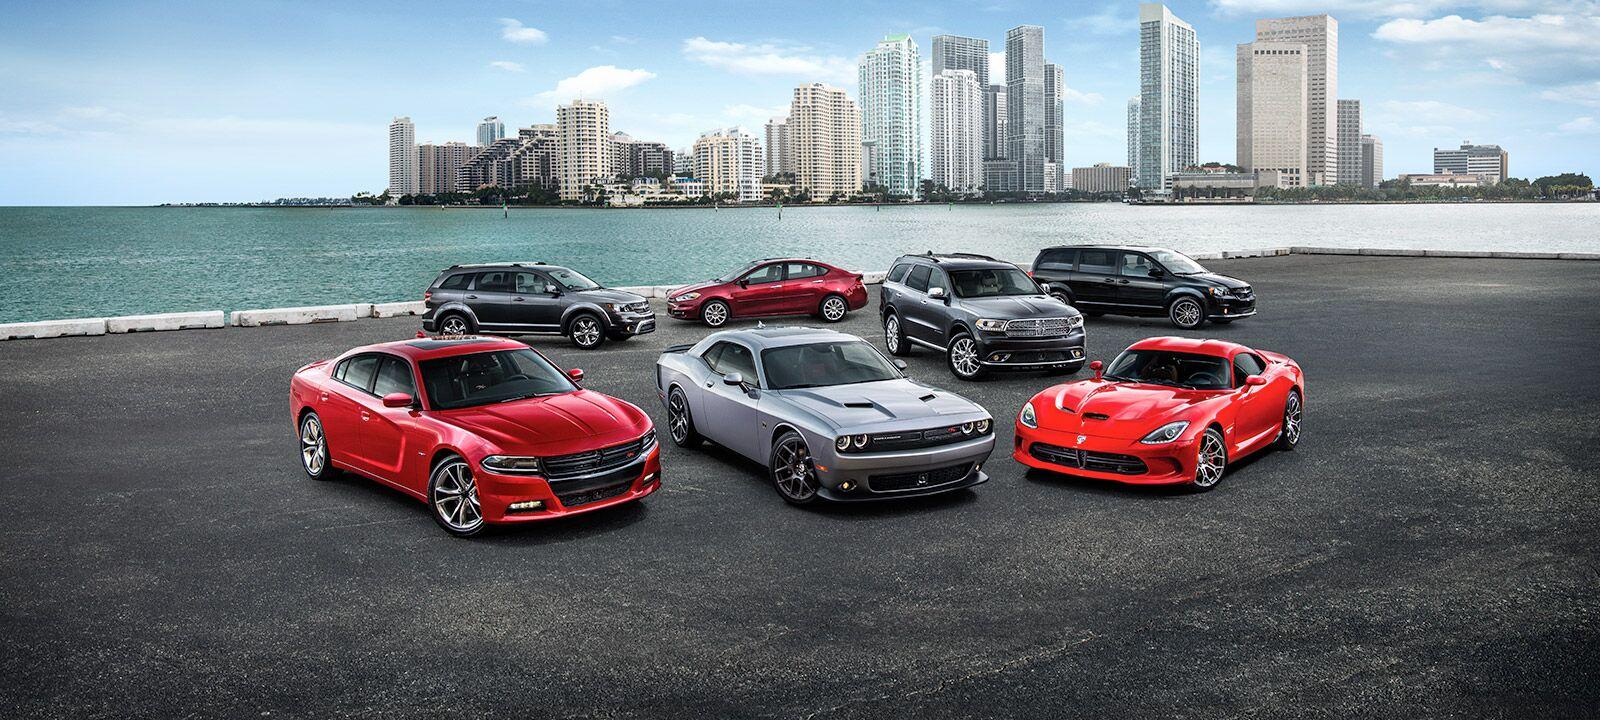 Dodge dealership miami for Southern motors springfield chrysler dodge jeep